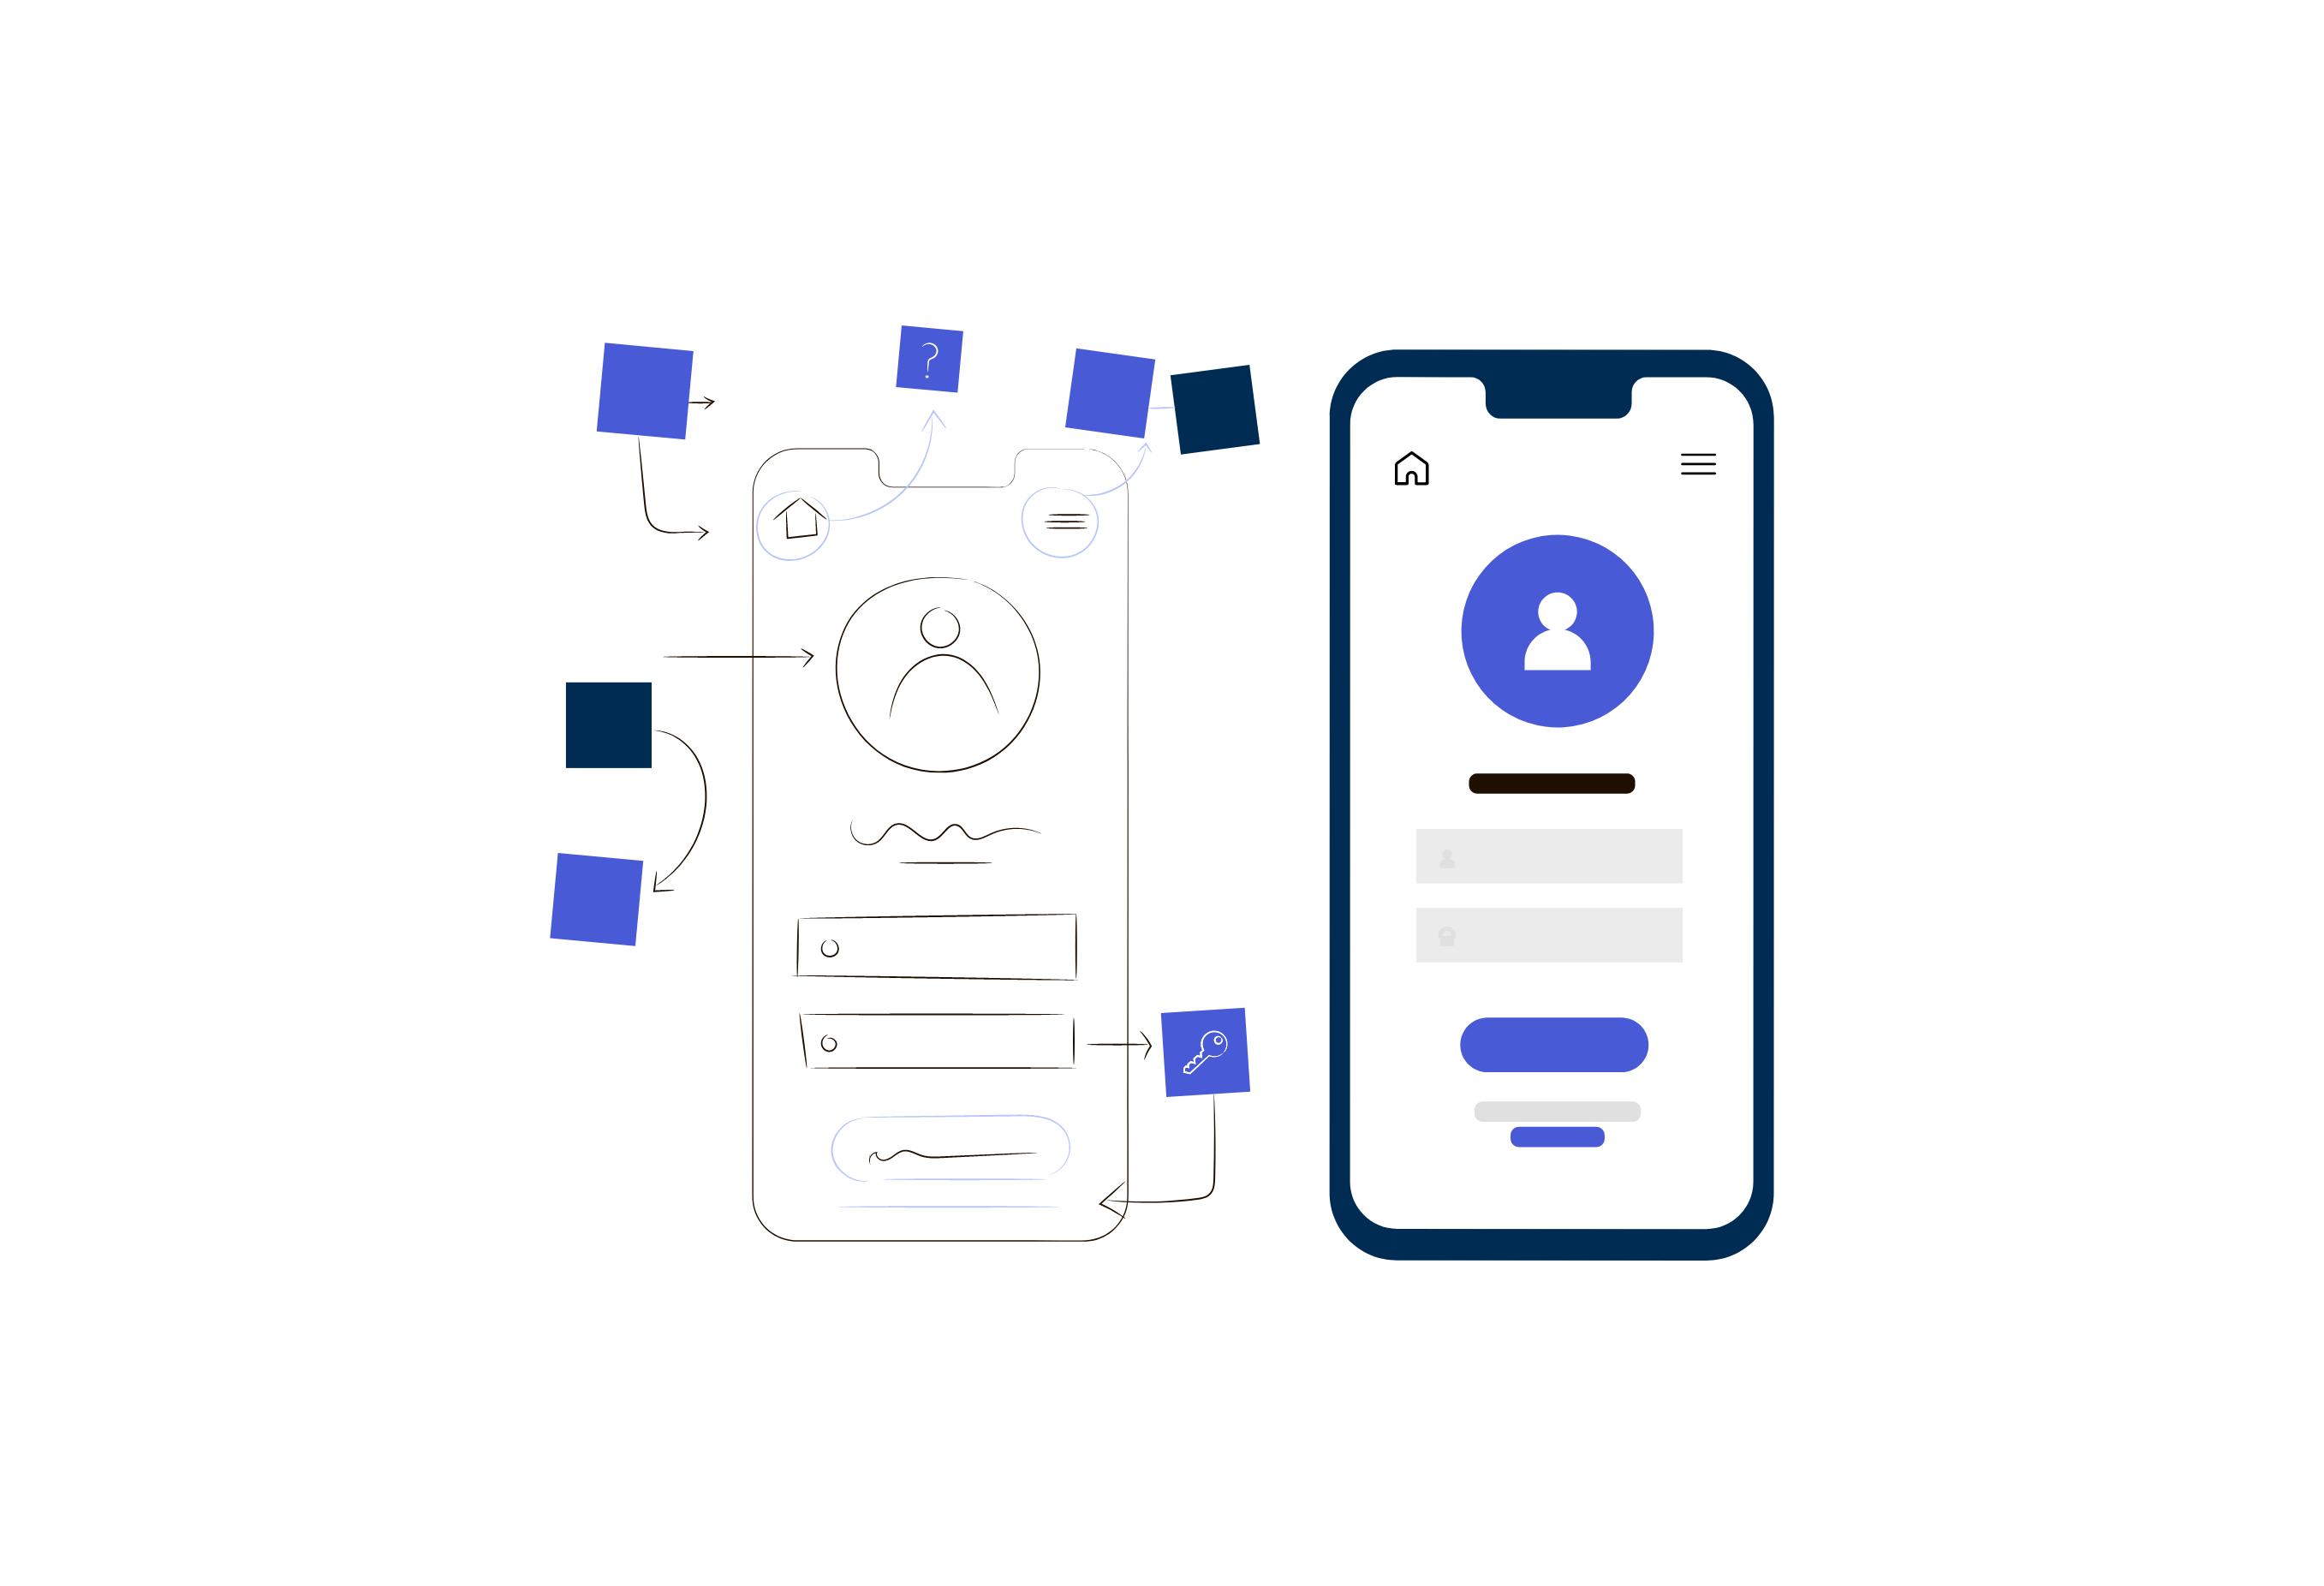 Mobile Application Development Process - Wireframes